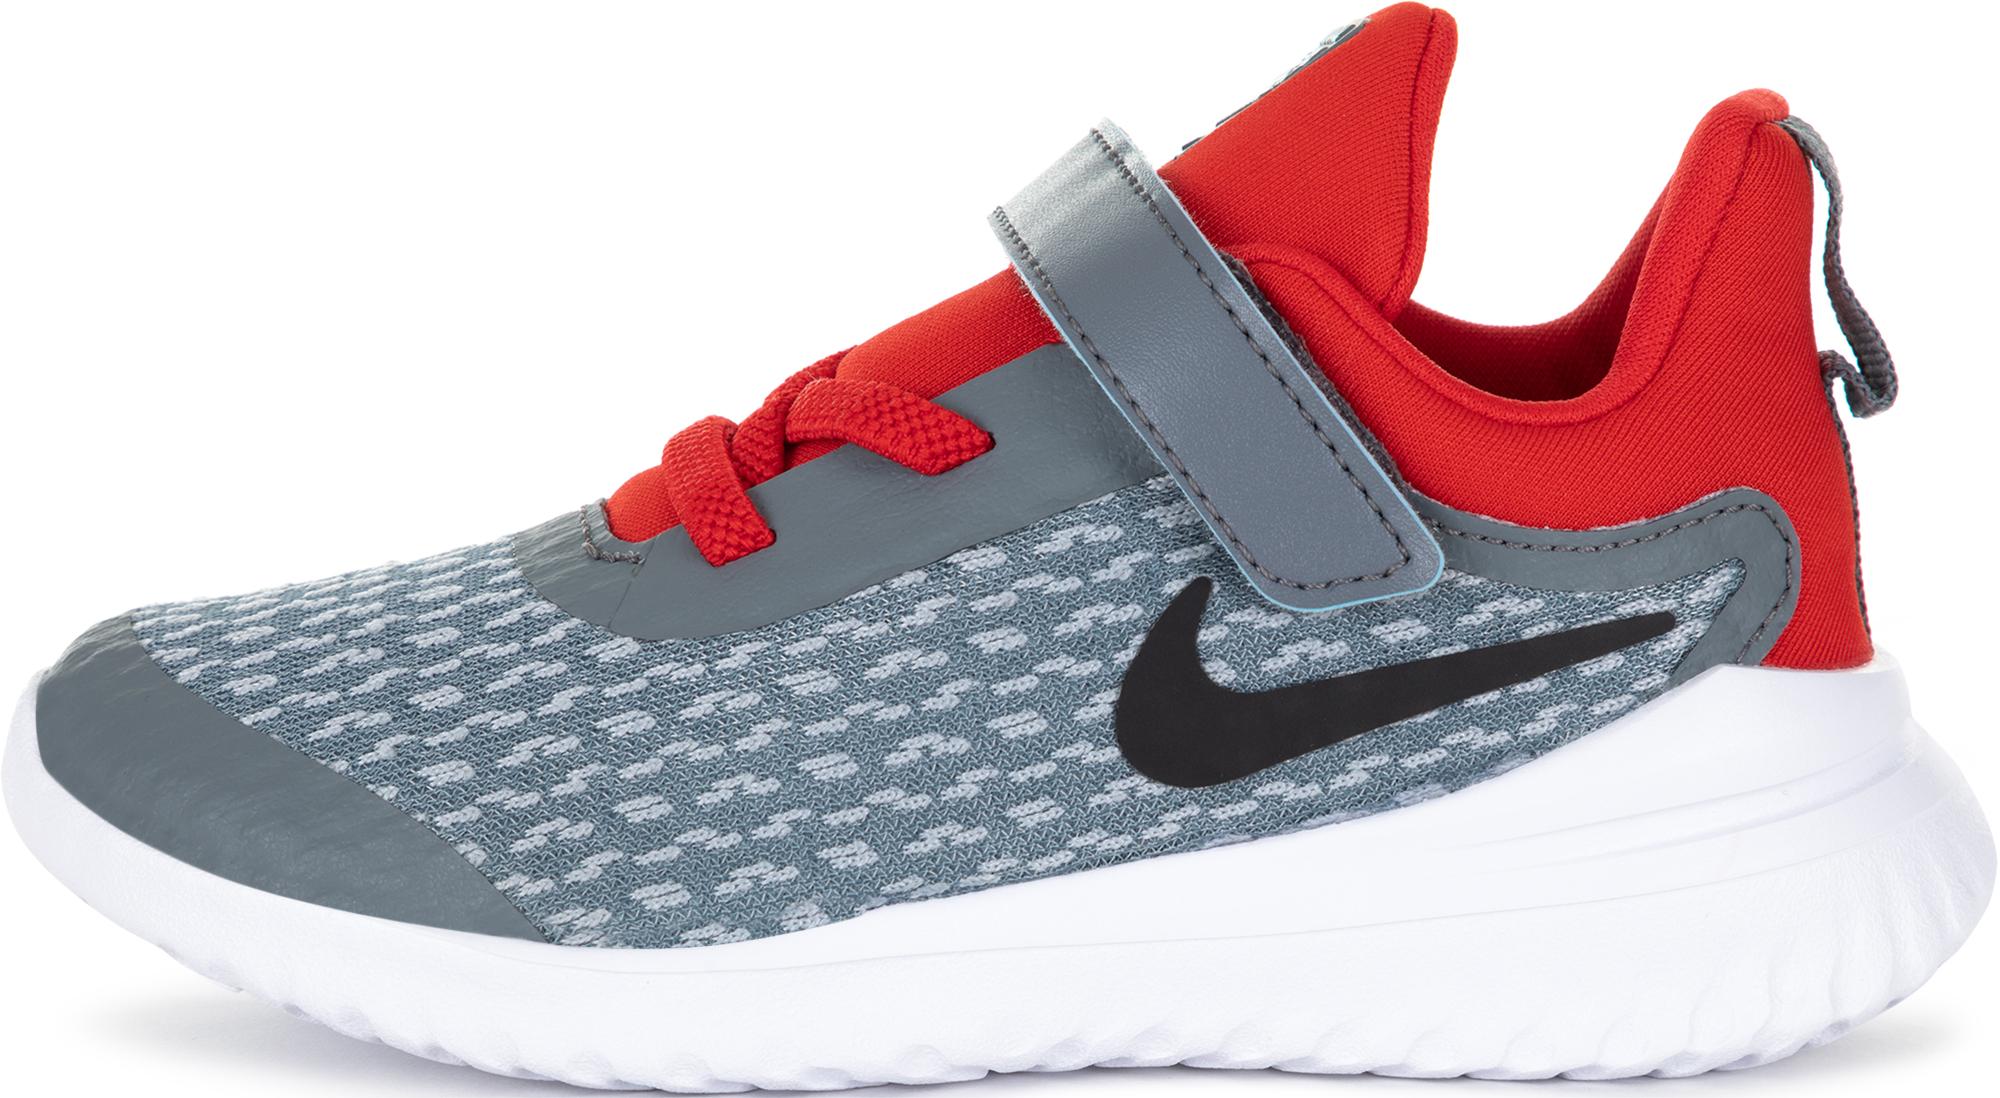 Nike Кроссовки для мальчиков Nike Rival, размер 26